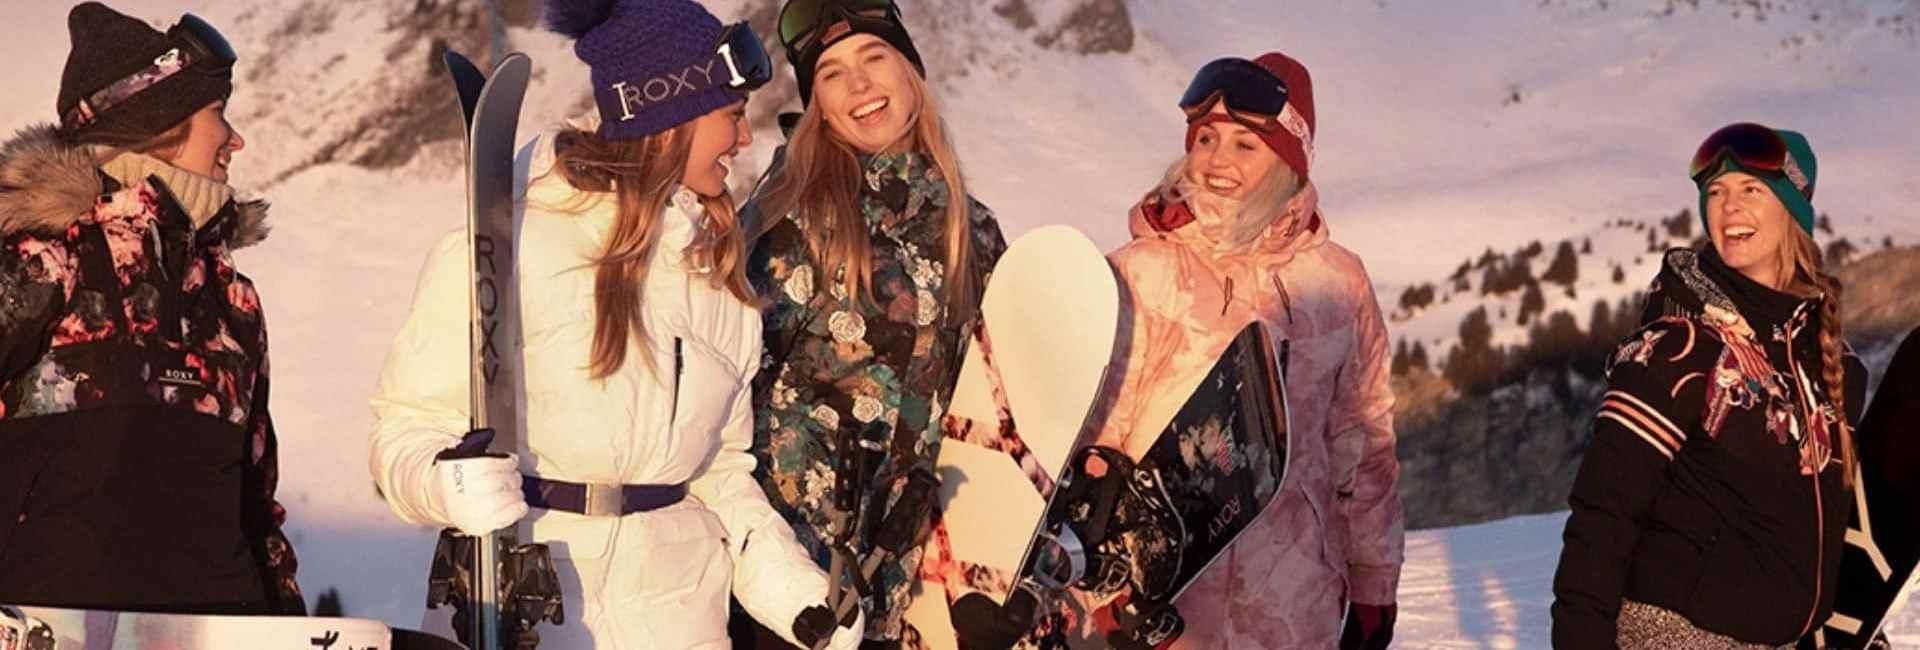 roxy-sports-hiver